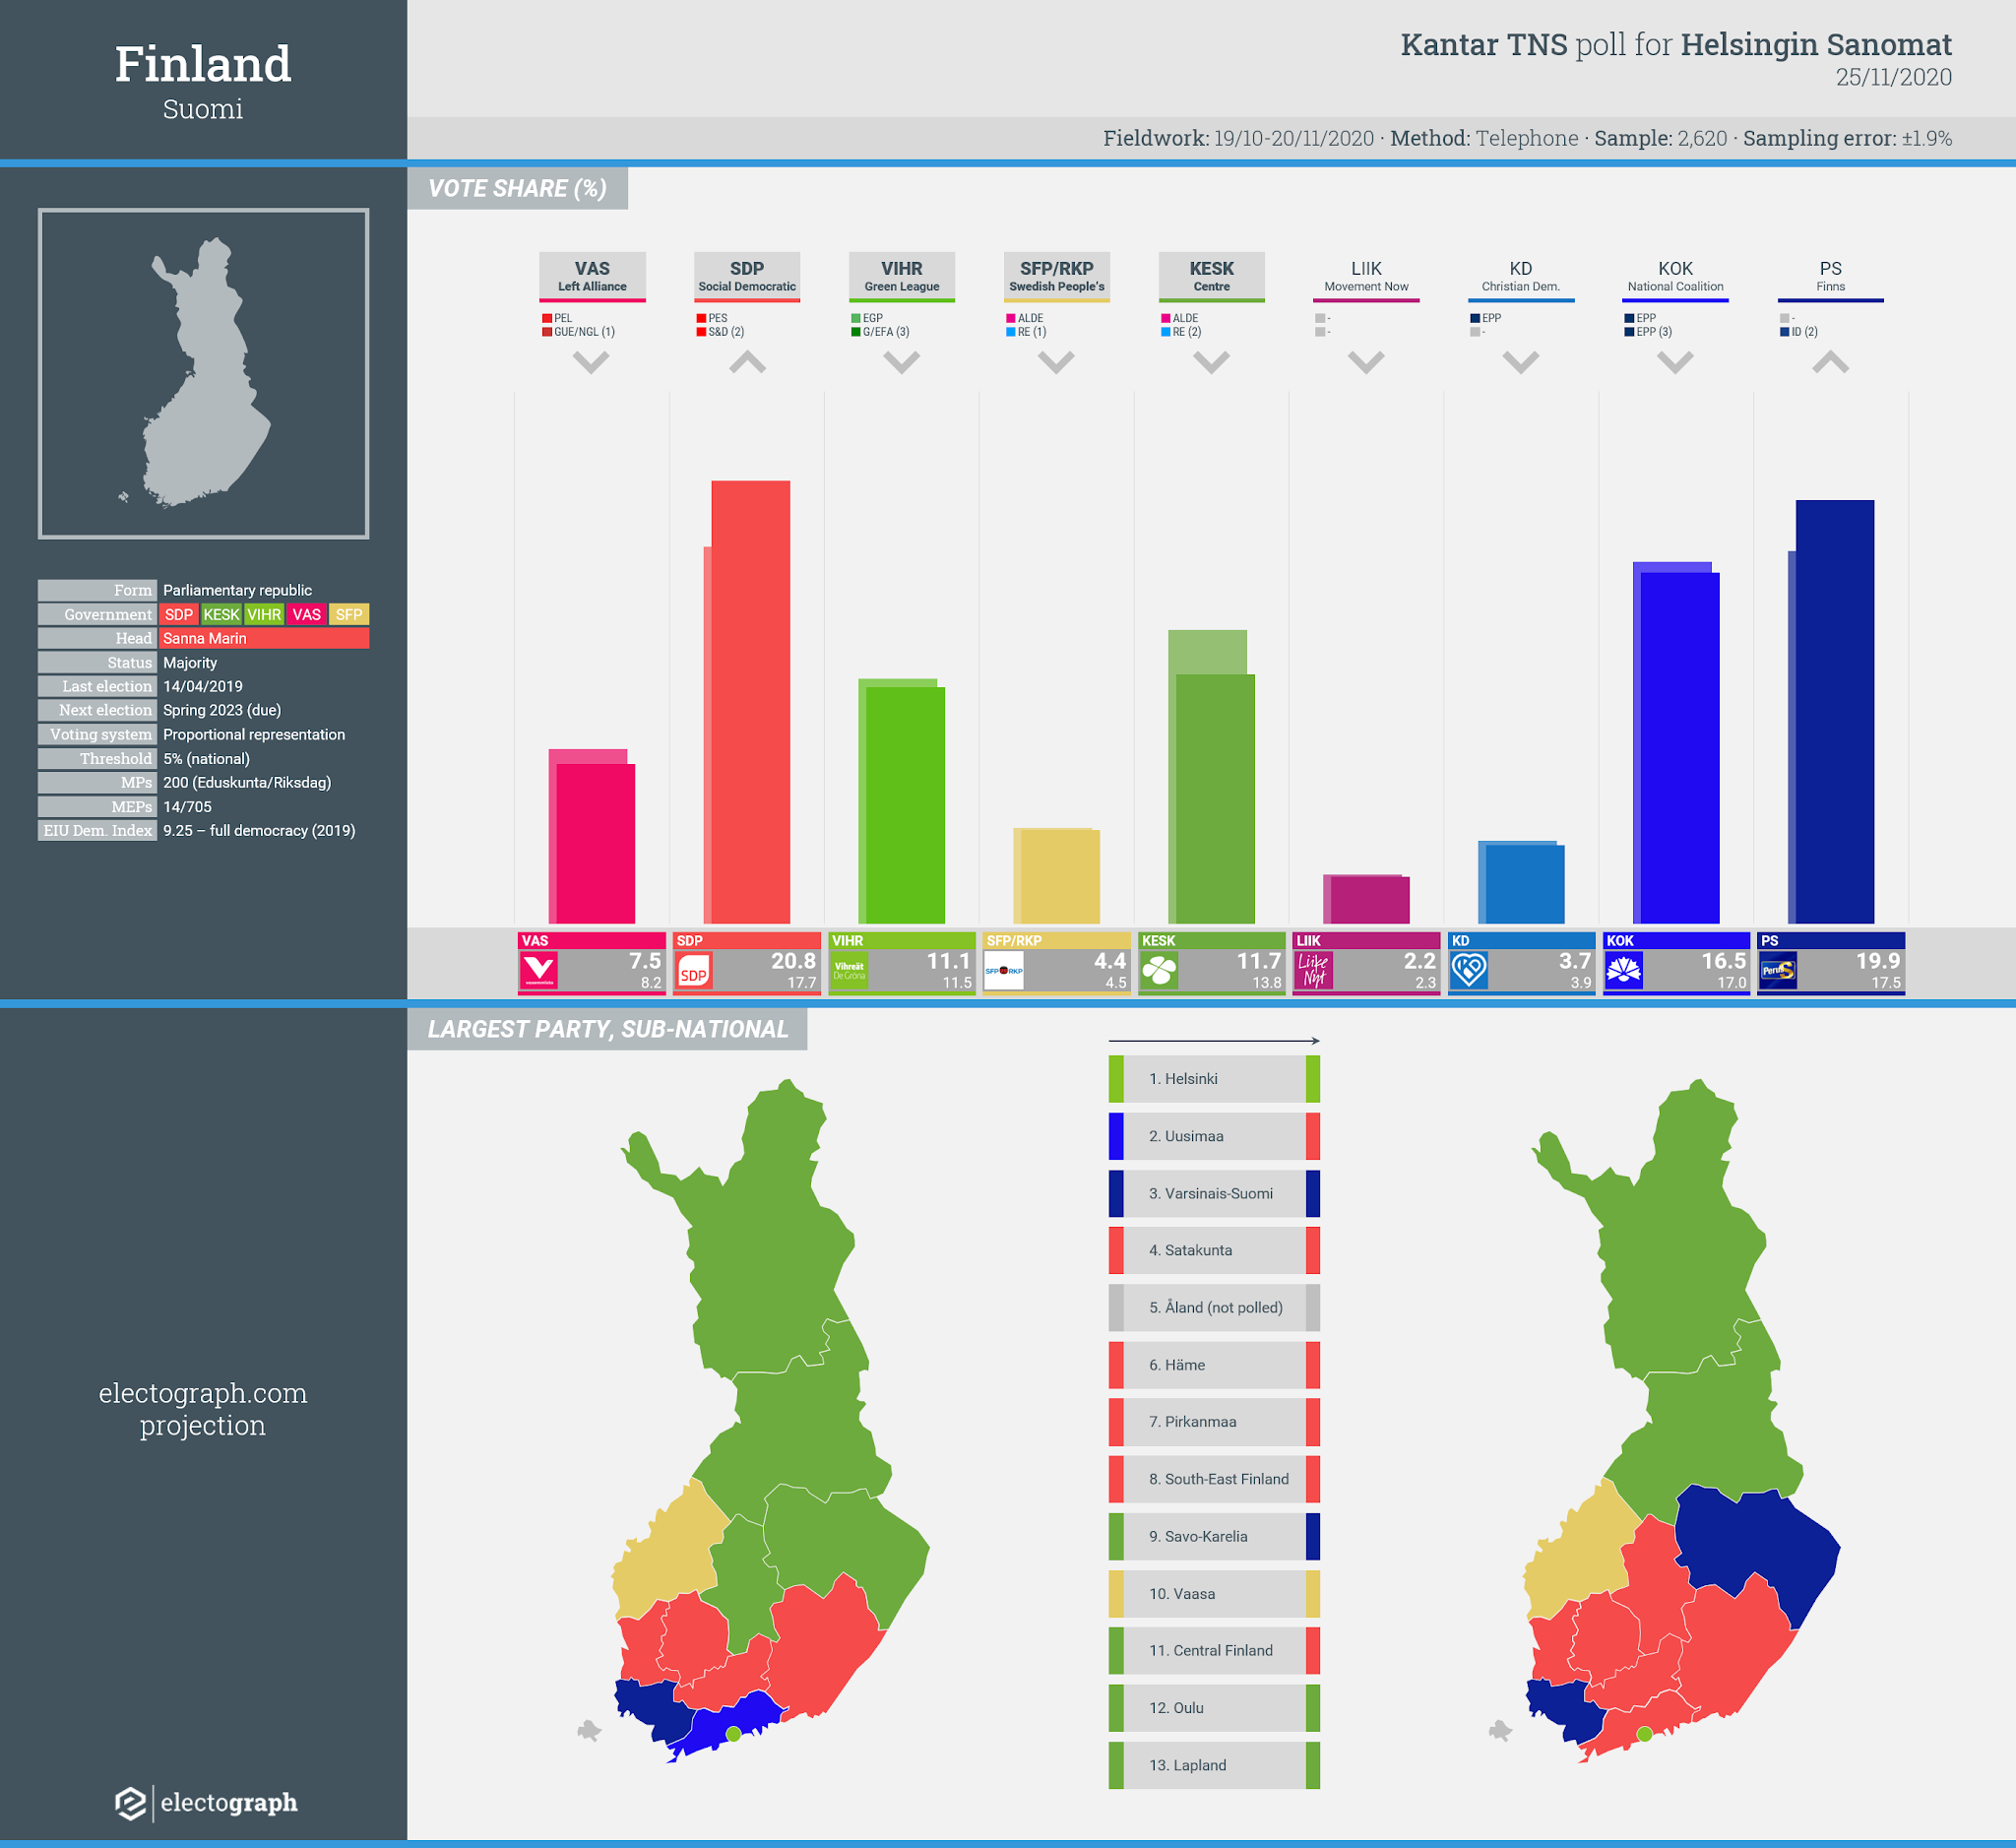 FINLAND: Kantar TNS poll chart for Helsingin Sanomat, 25 November 2020